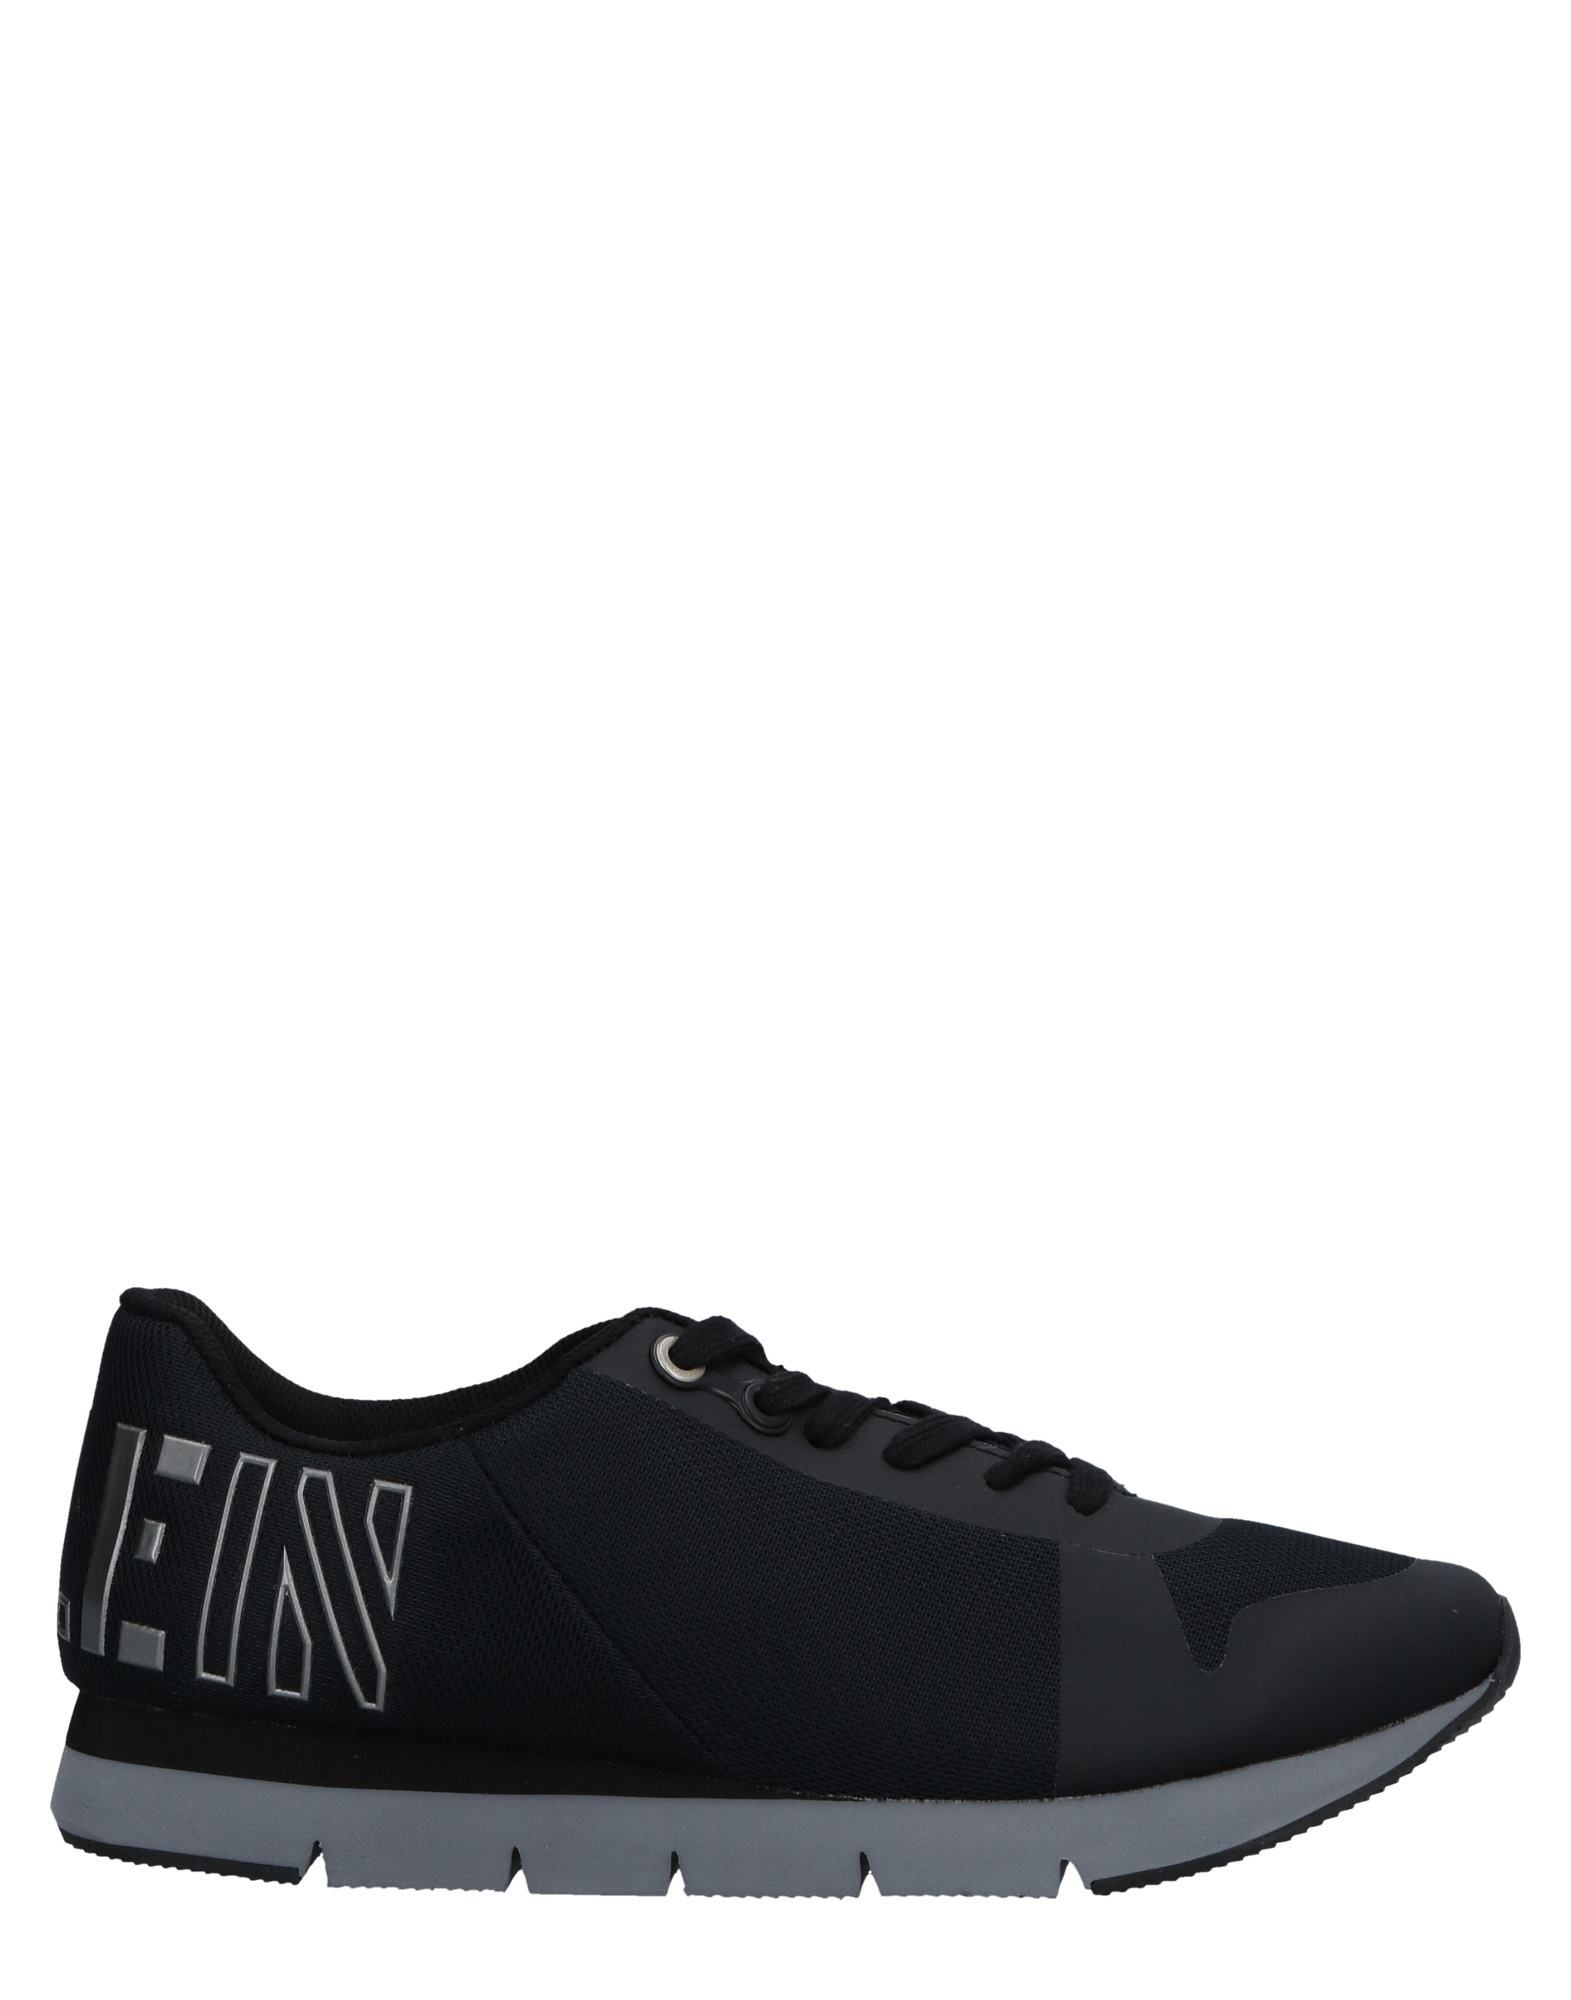 Sneakers Calvin Klein Jeans Uomo - 11517414QN